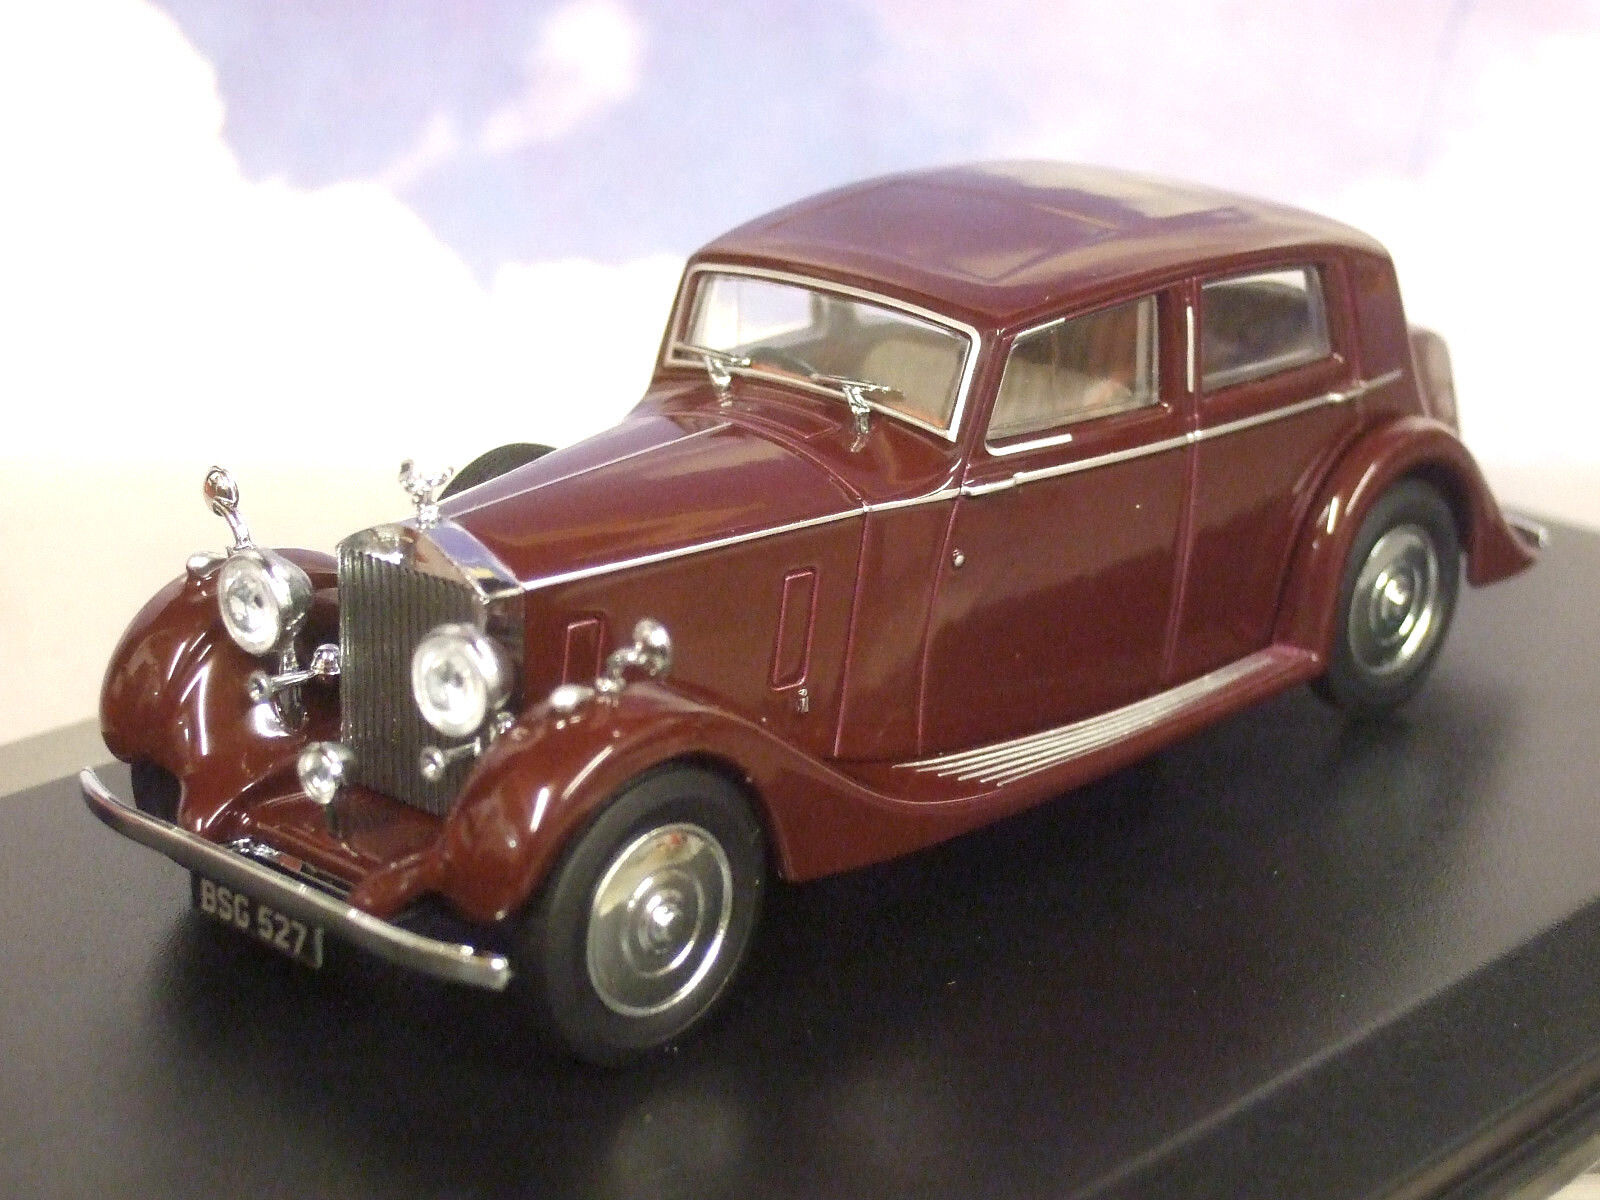 OXFORD 1 43 1936-1938 ROLLS ROYCE 25 30 THRUPP & MABERLY BURGUNDY RED 43R25001